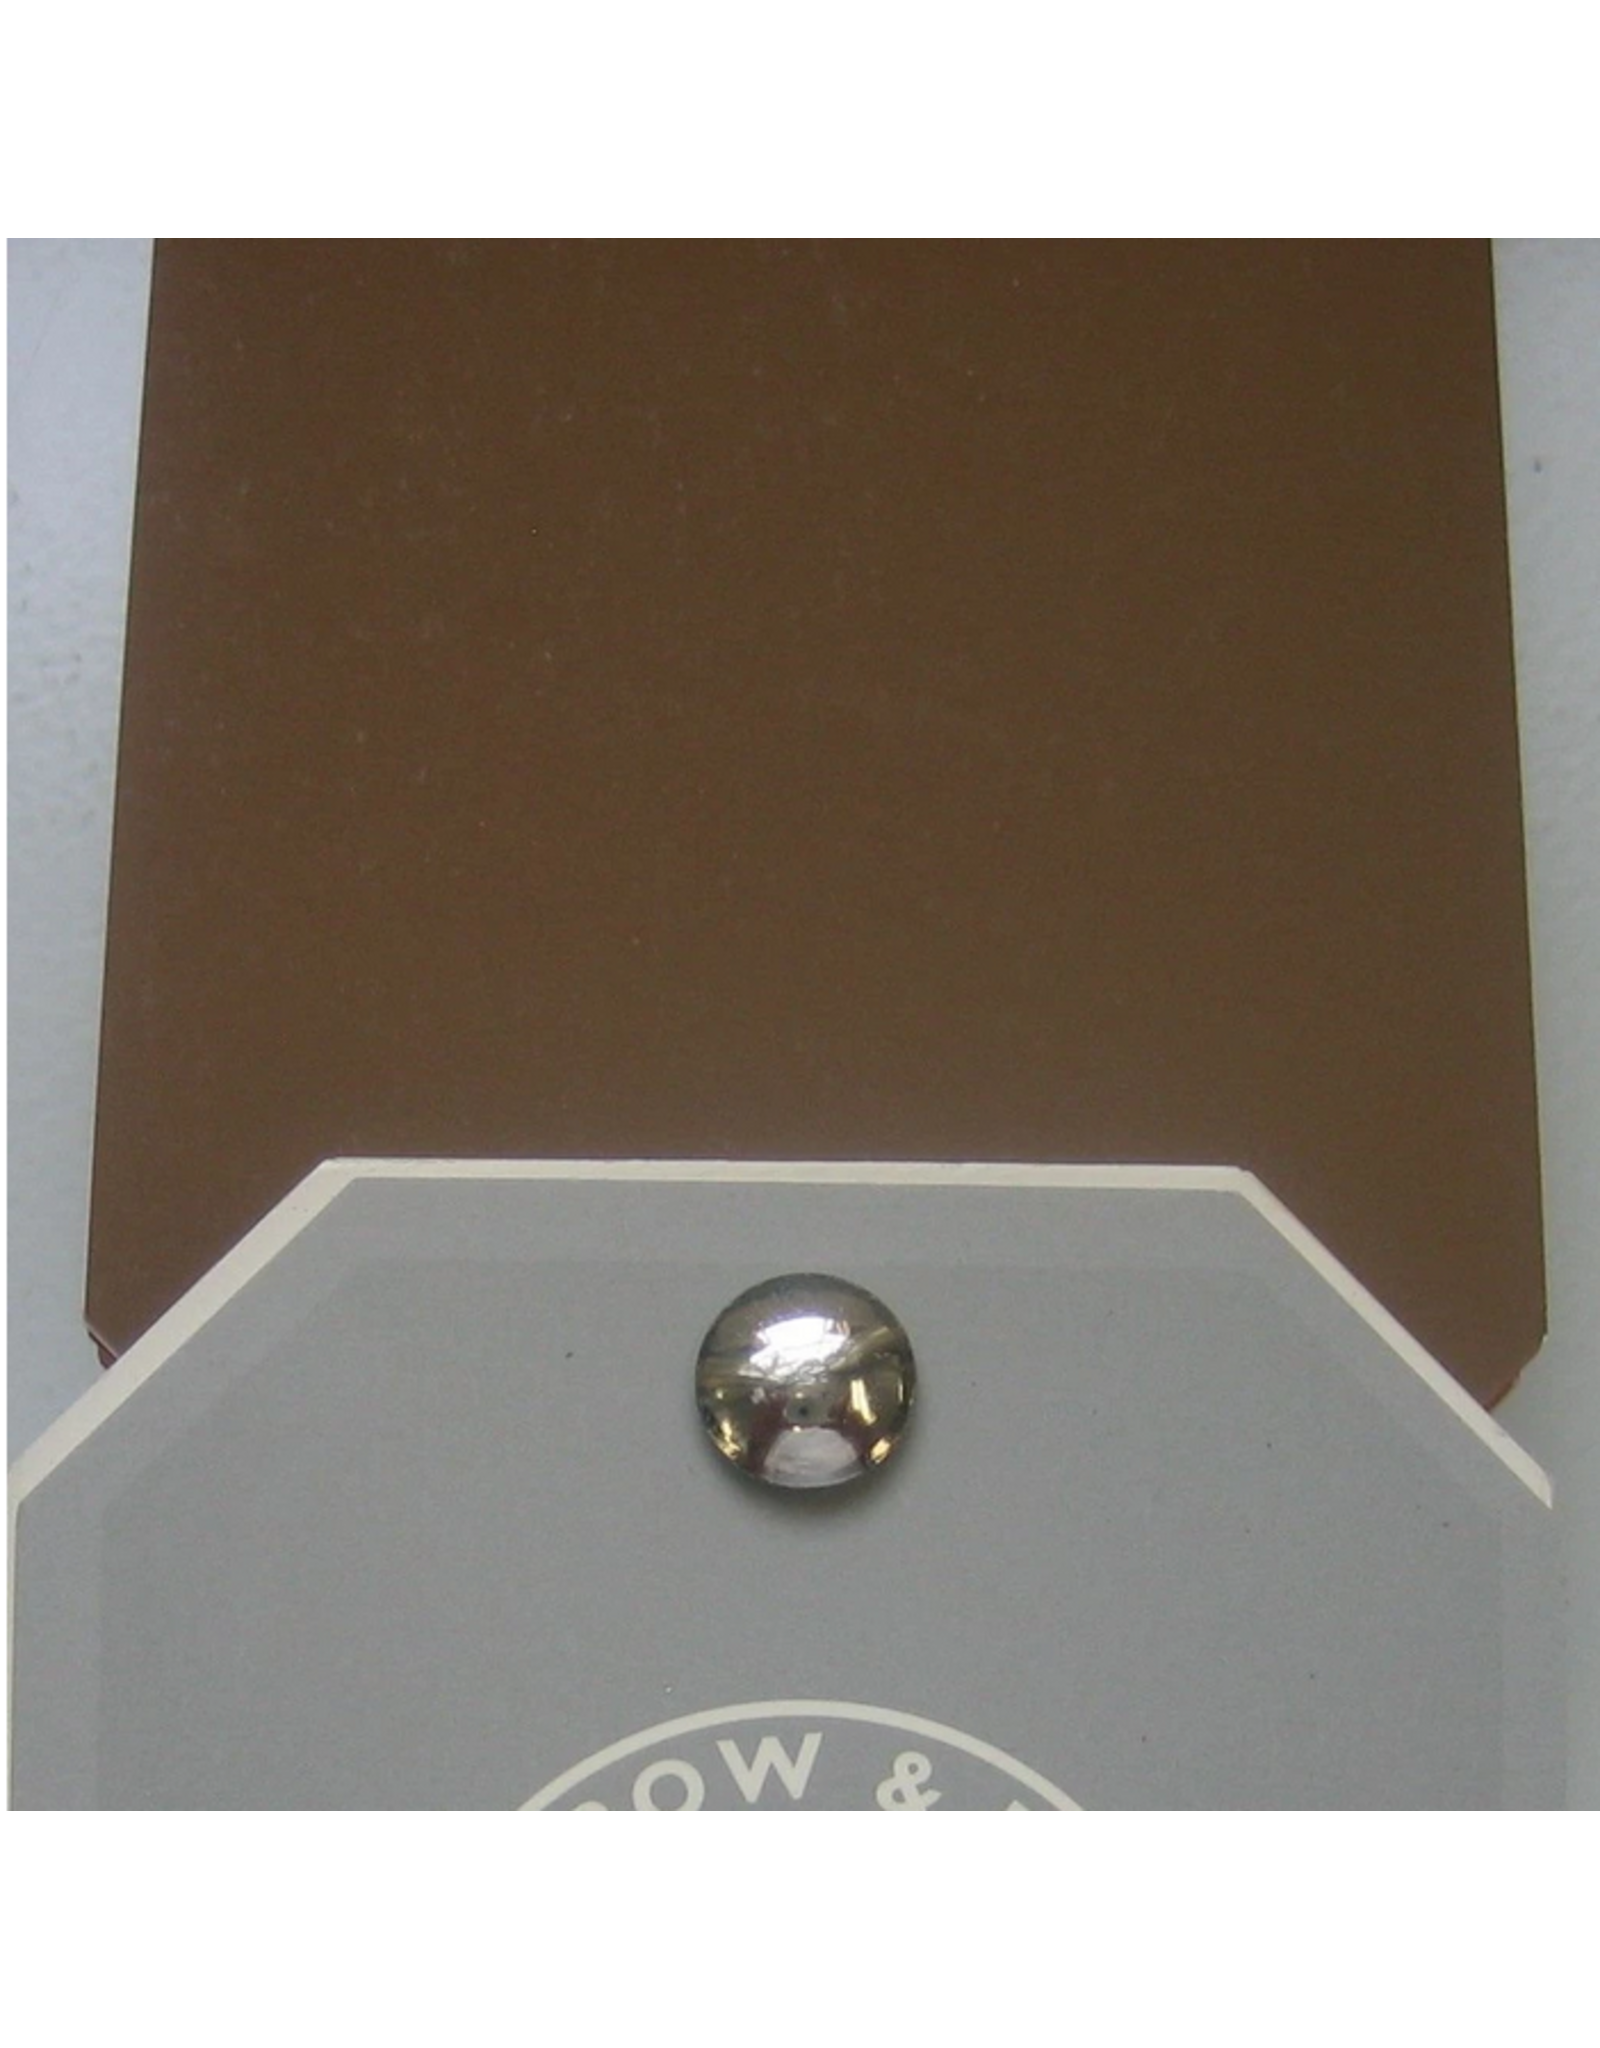 Farrow and Ball Gallon Modern Emulsion Wainscot No. 55